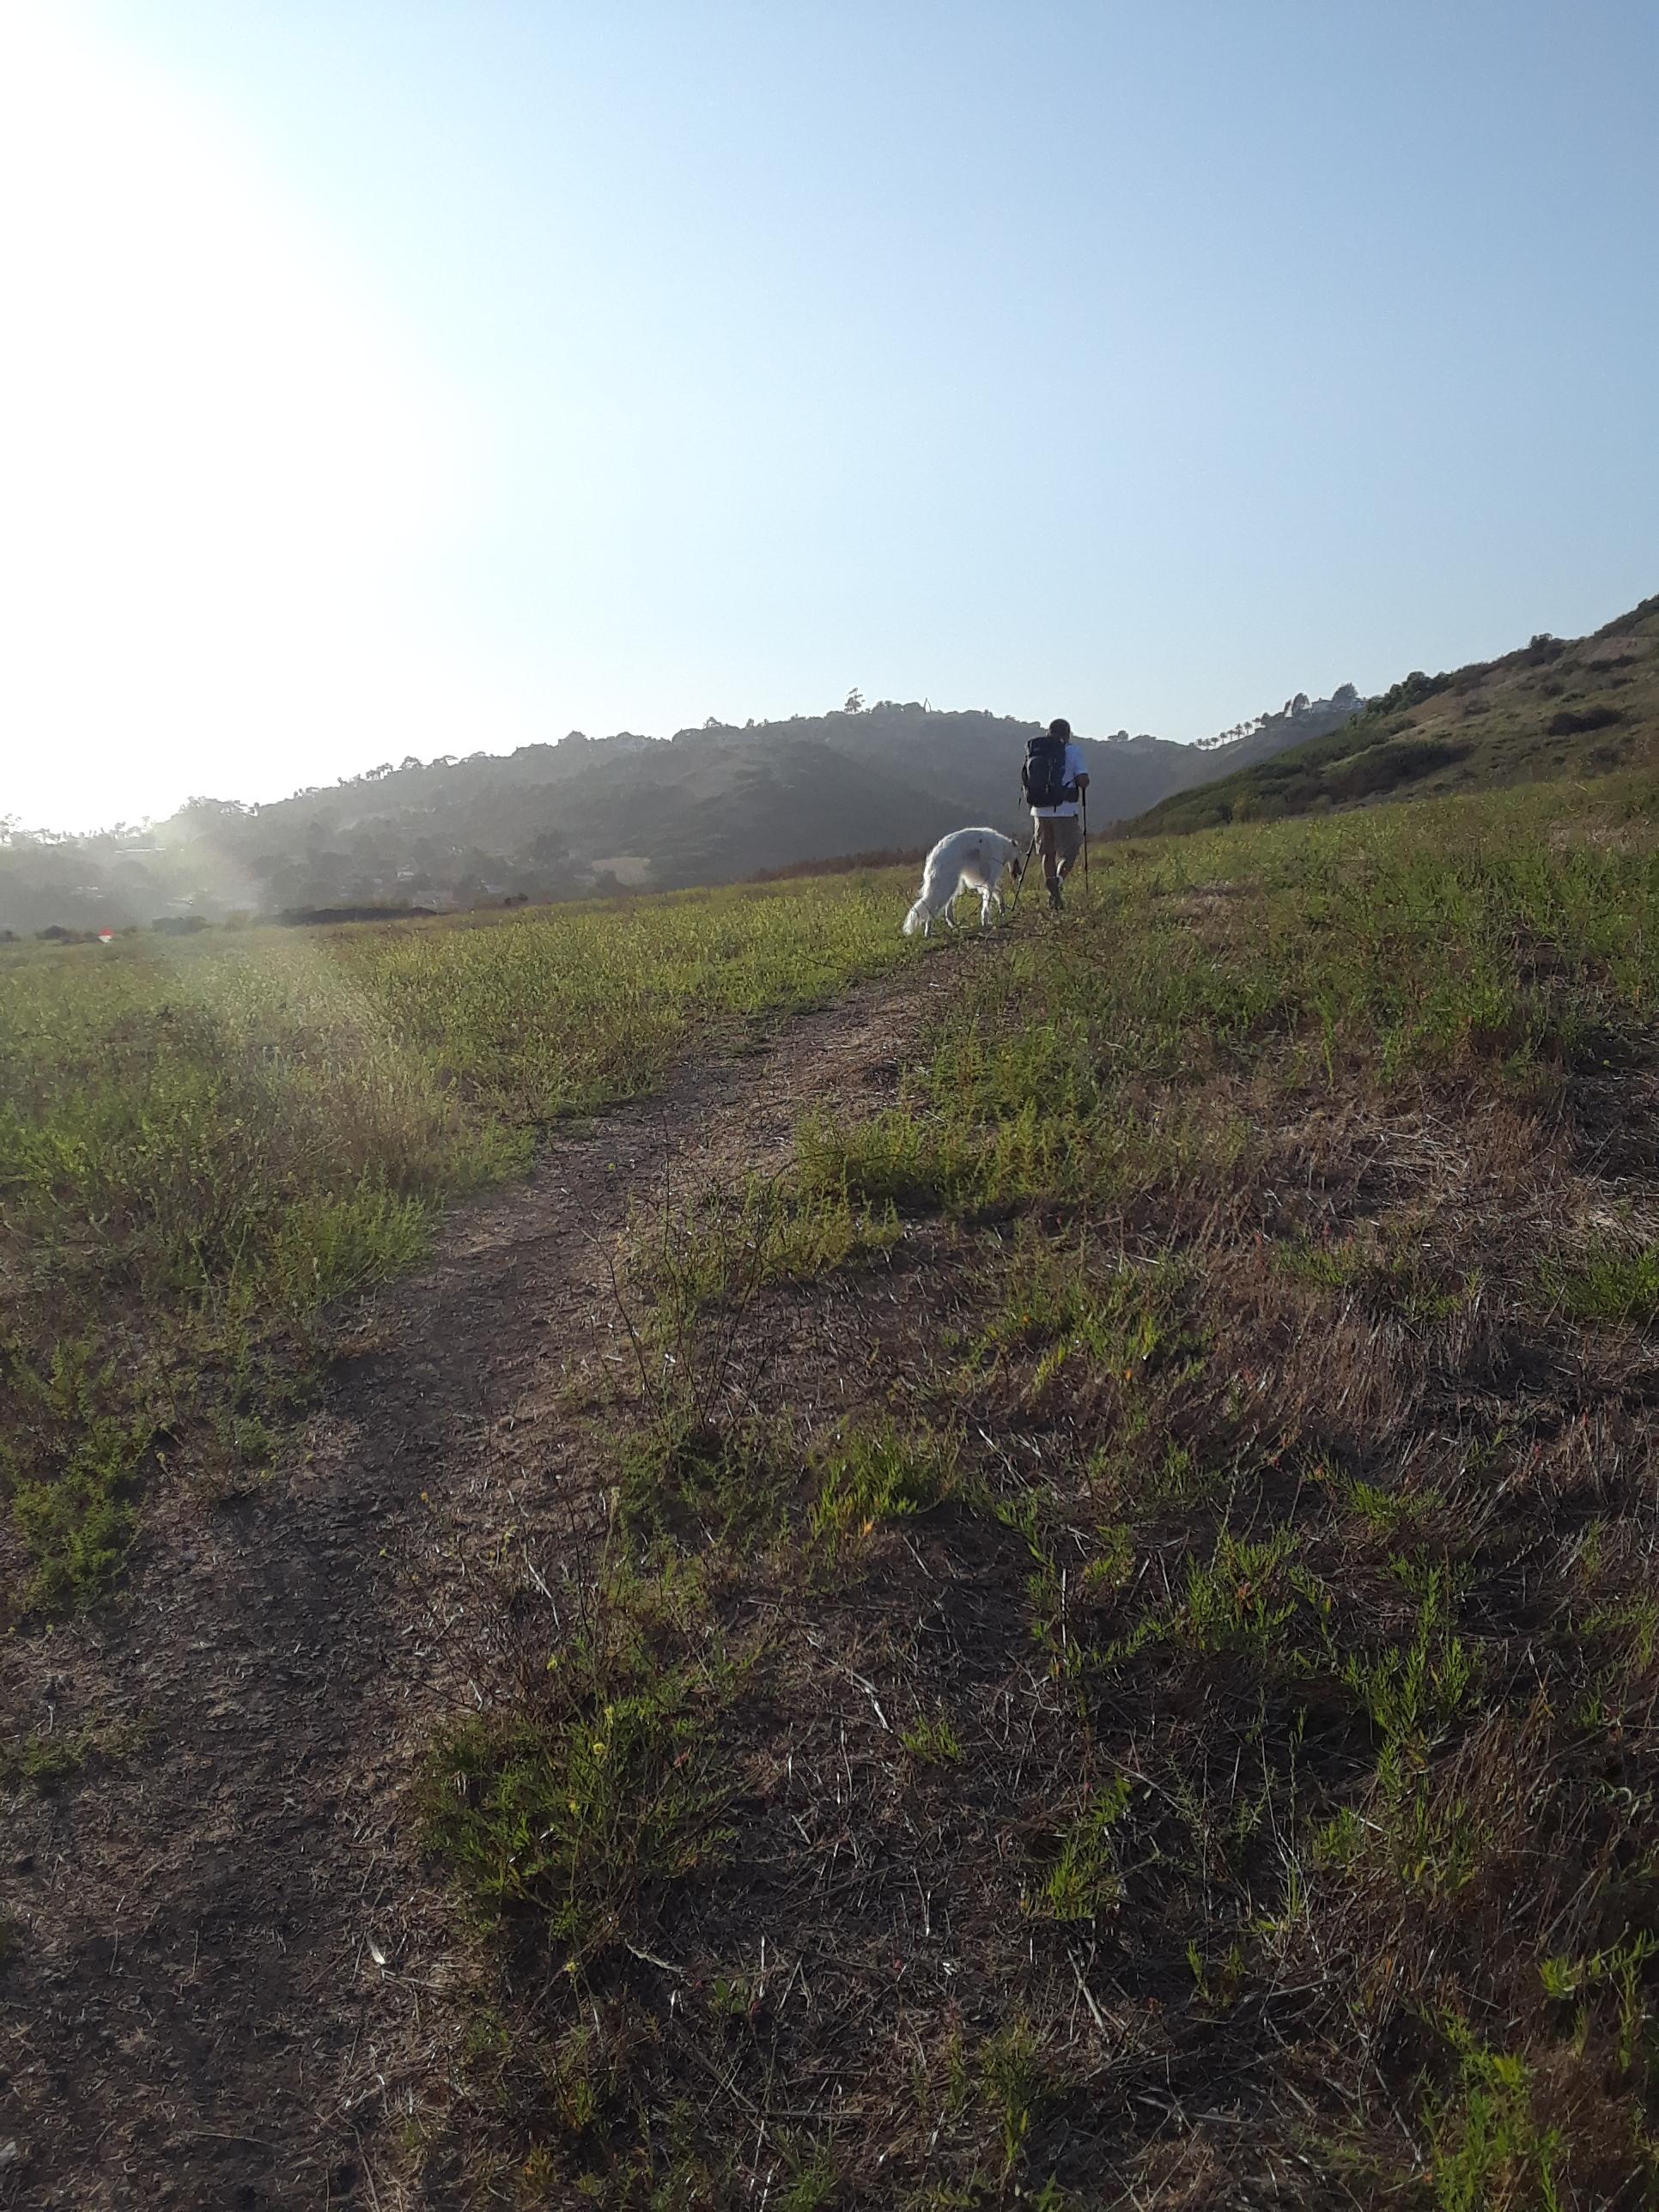 Walking the Santa Barbara hills with trekking poles.